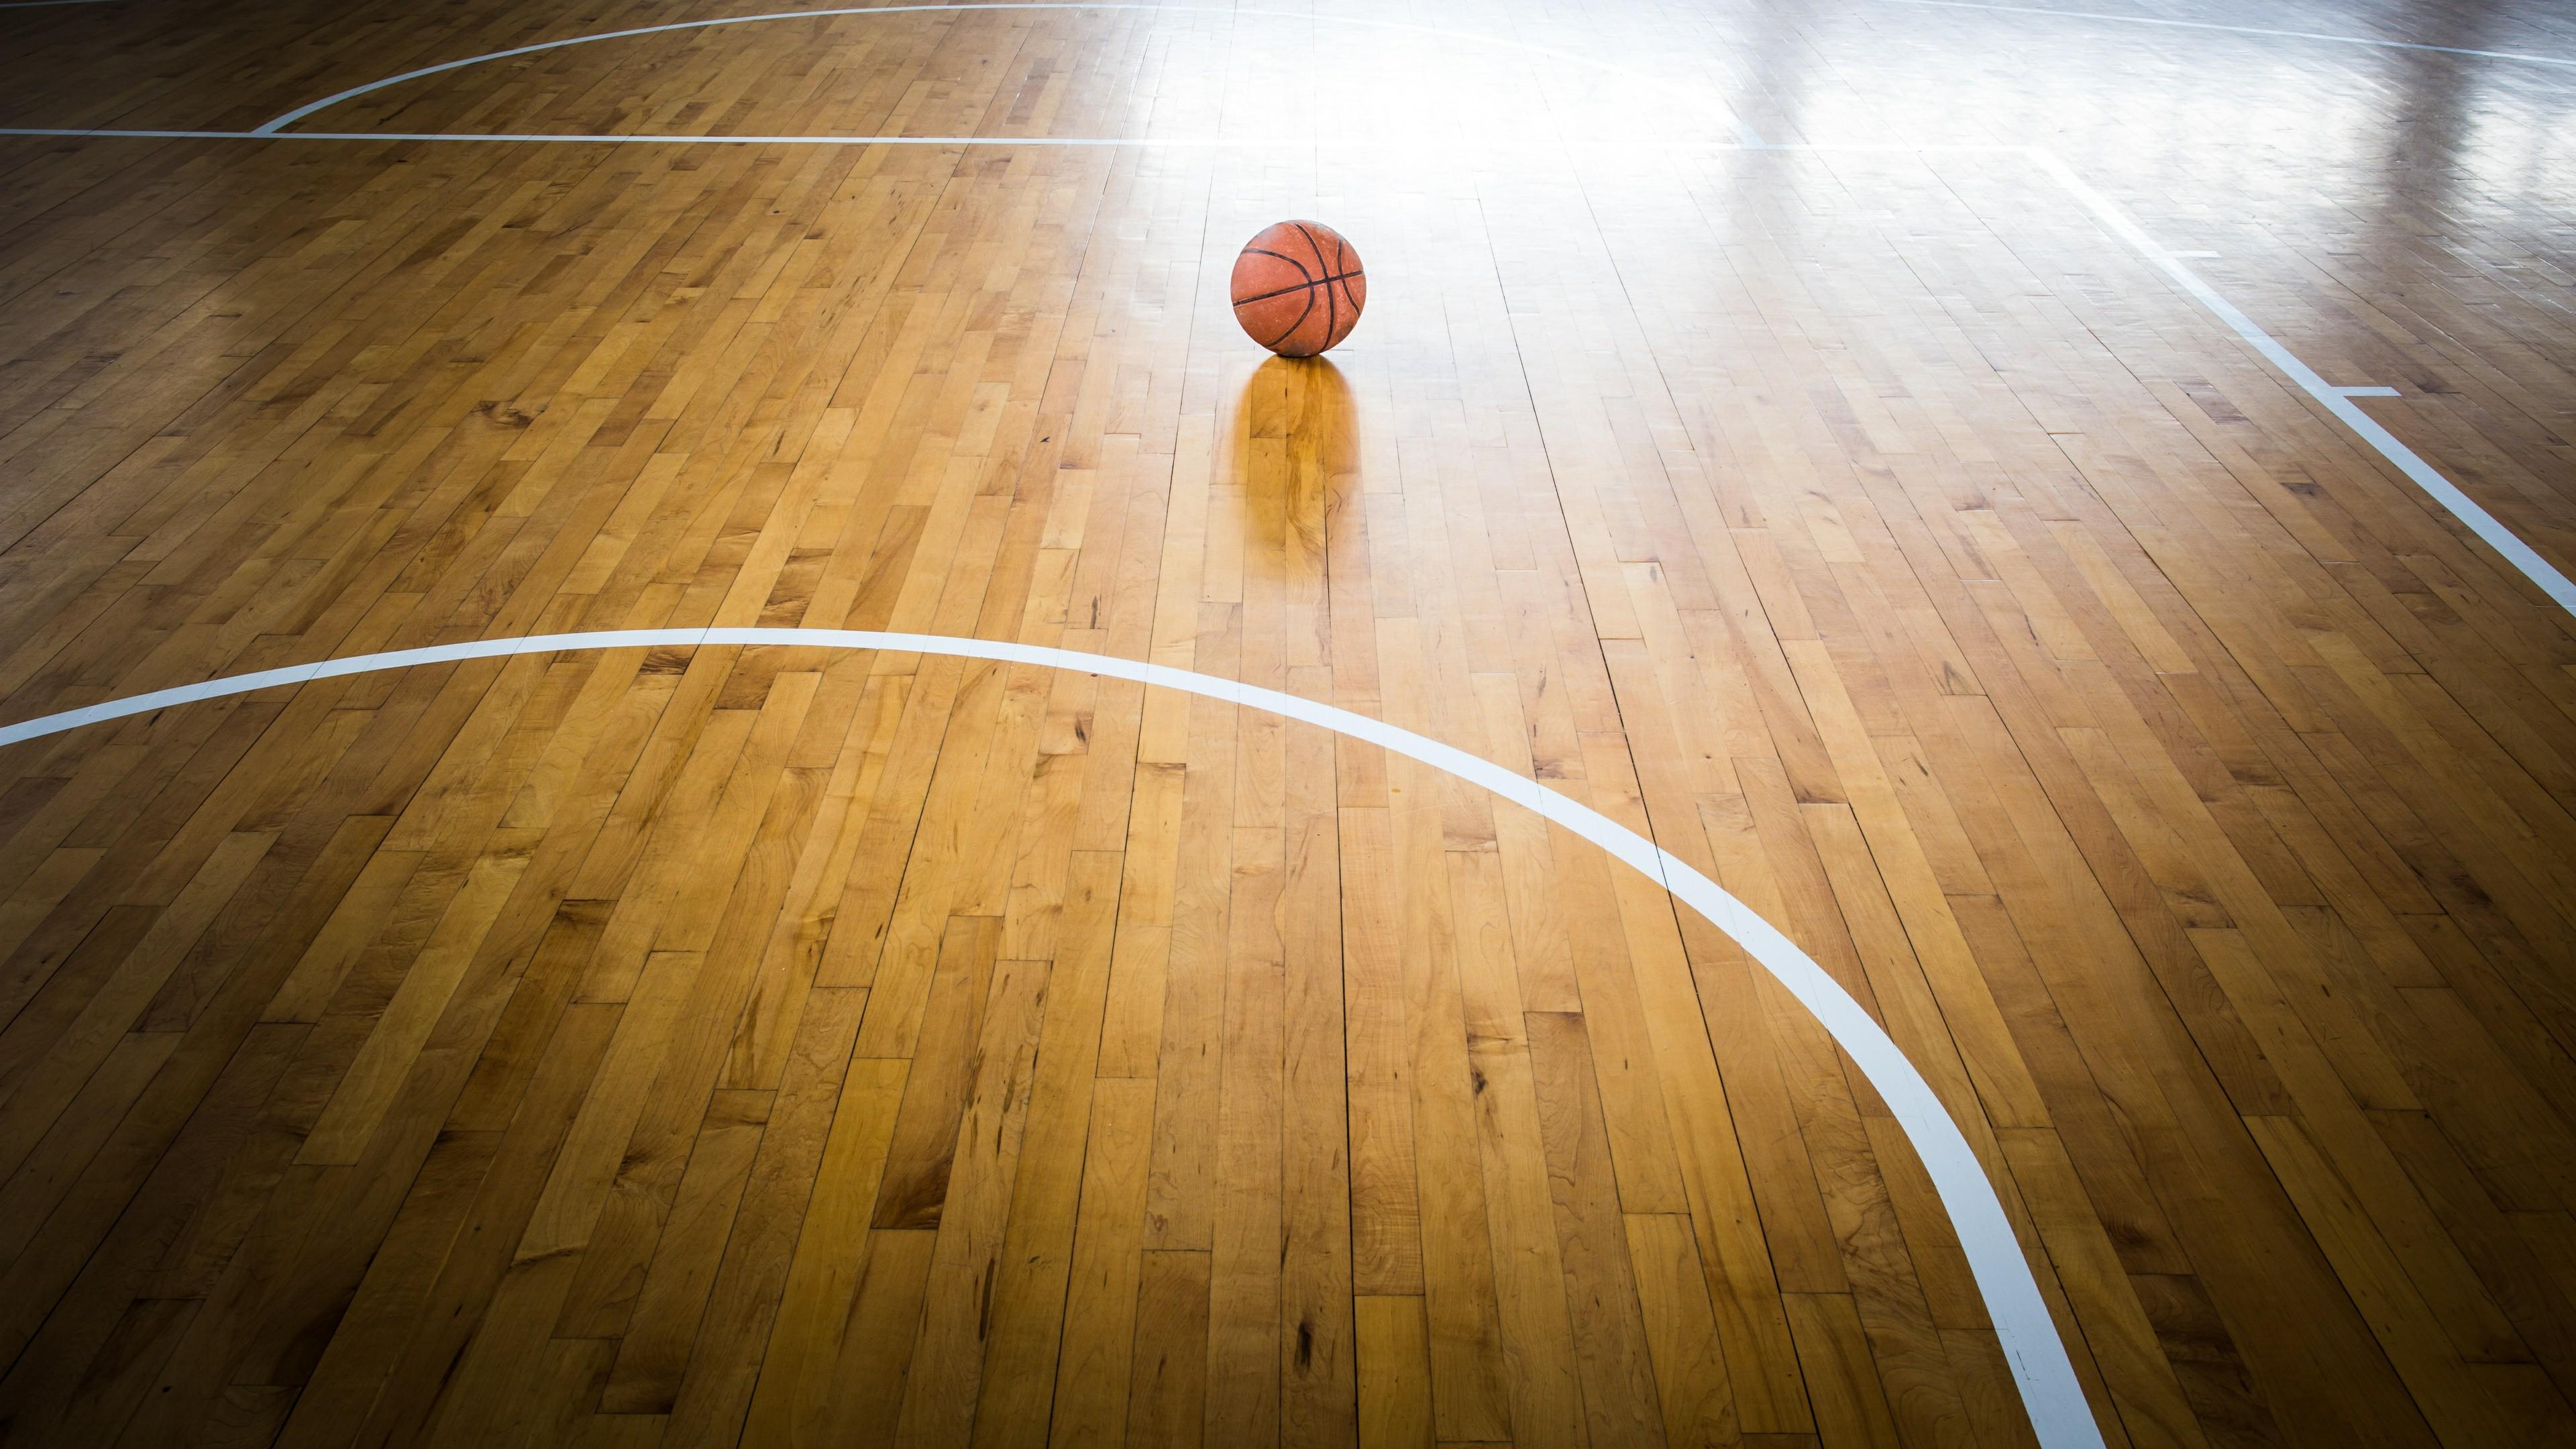 Basketball court floor wallpaper